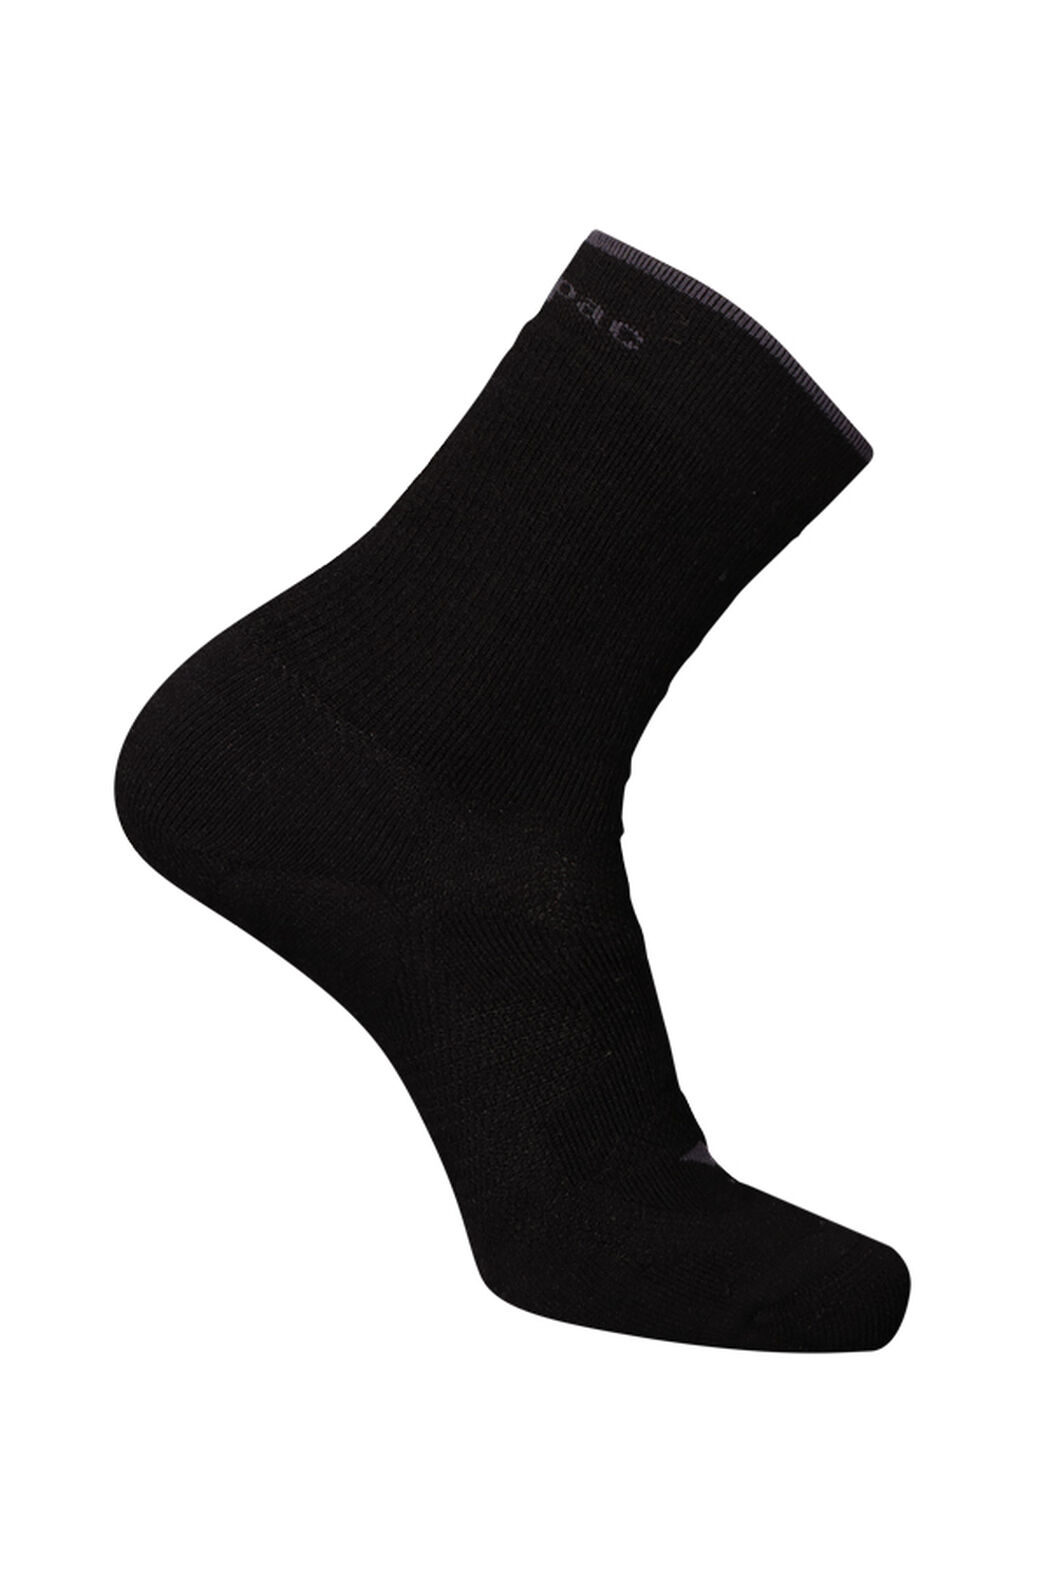 Macpac Merino Hiker Socks, Black, hi-res